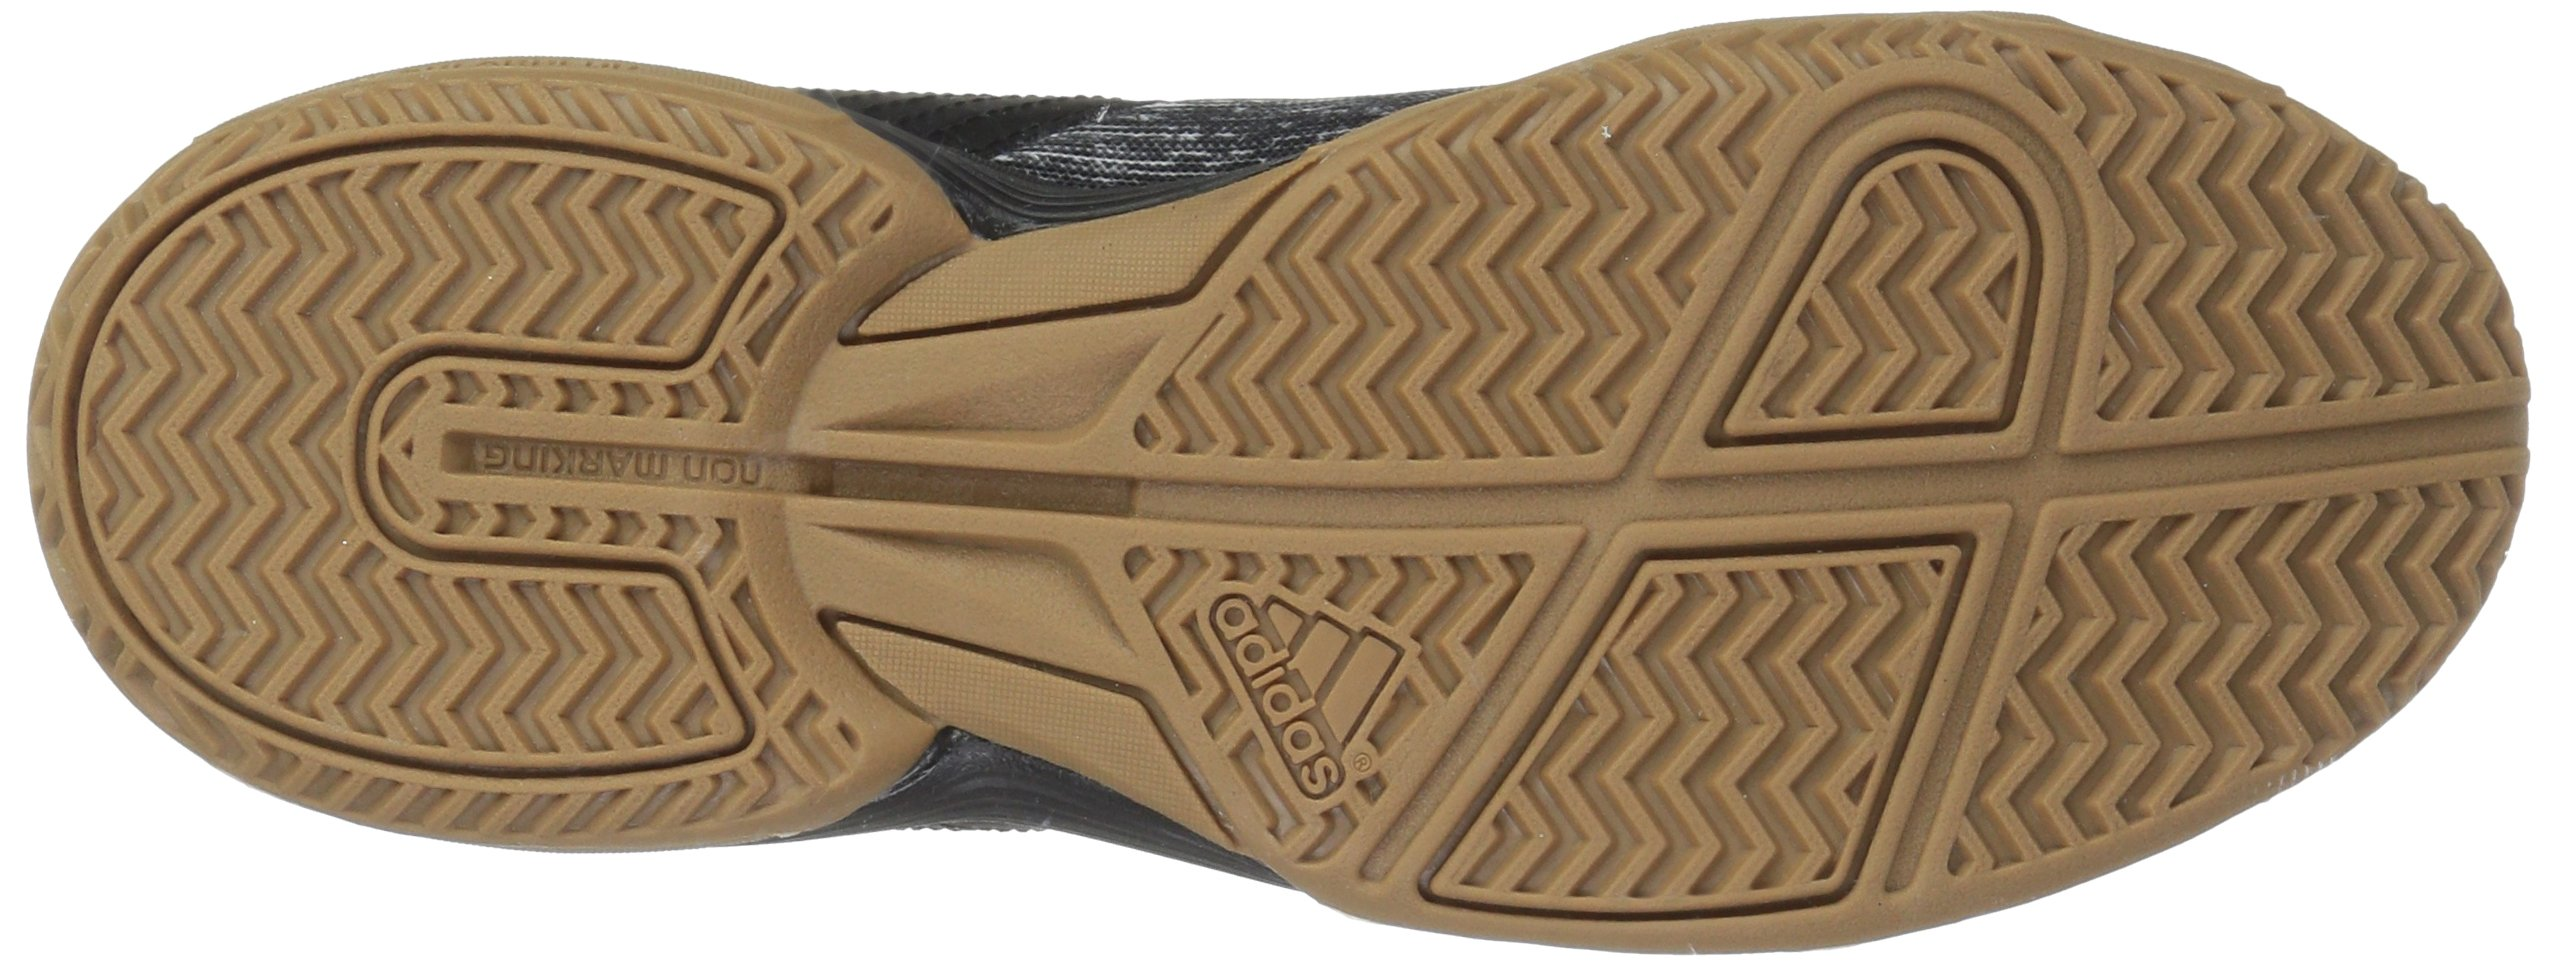 adidas Women's Ligra 6 Volleyball Shoe, Black/Silver Metallic/White, 7 M US by adidas (Image #3)